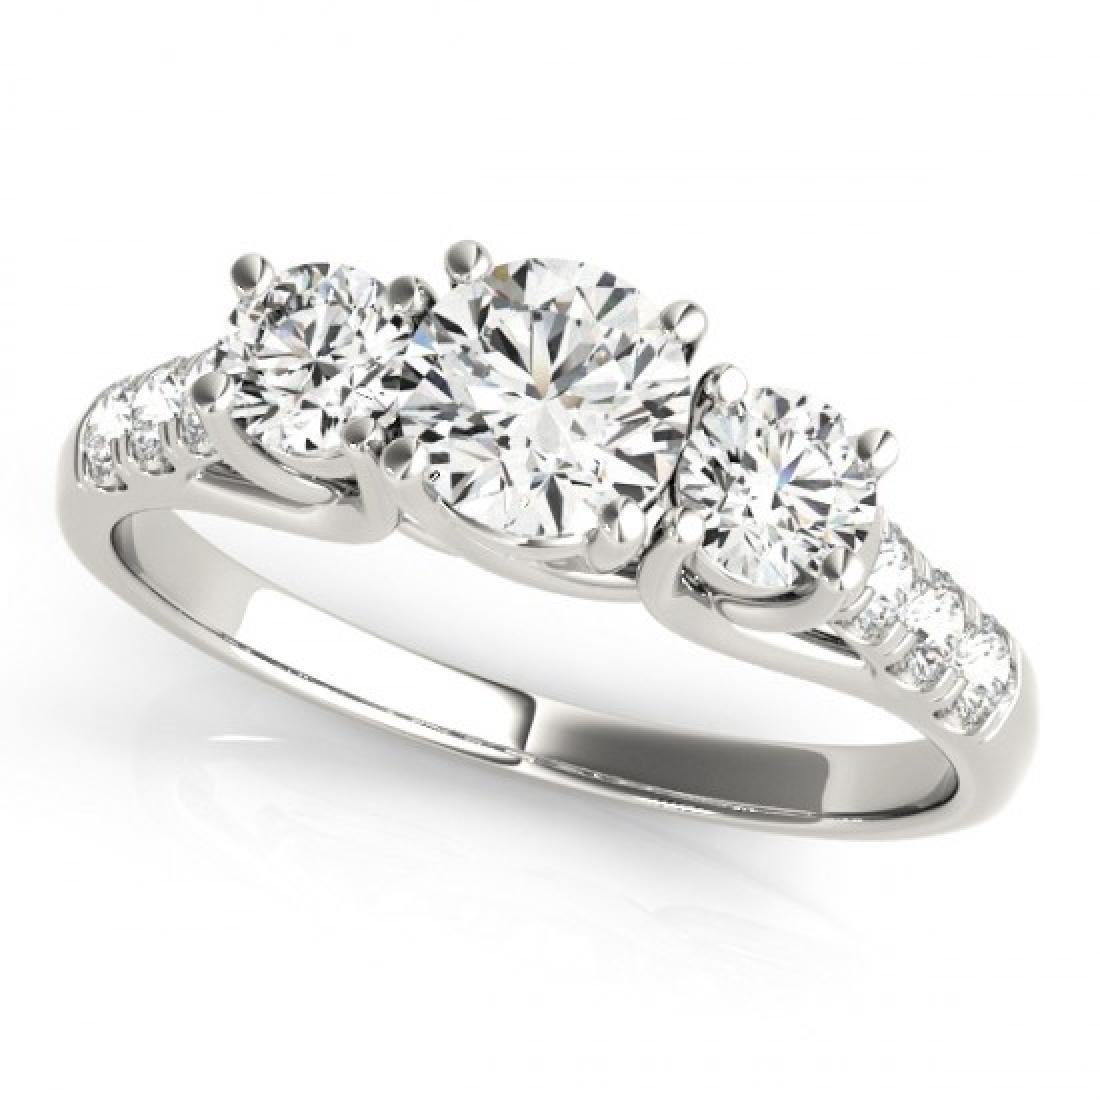 1.25 CTW Certified VS/SI Diamond 3 Stone Ring 14K White - 2